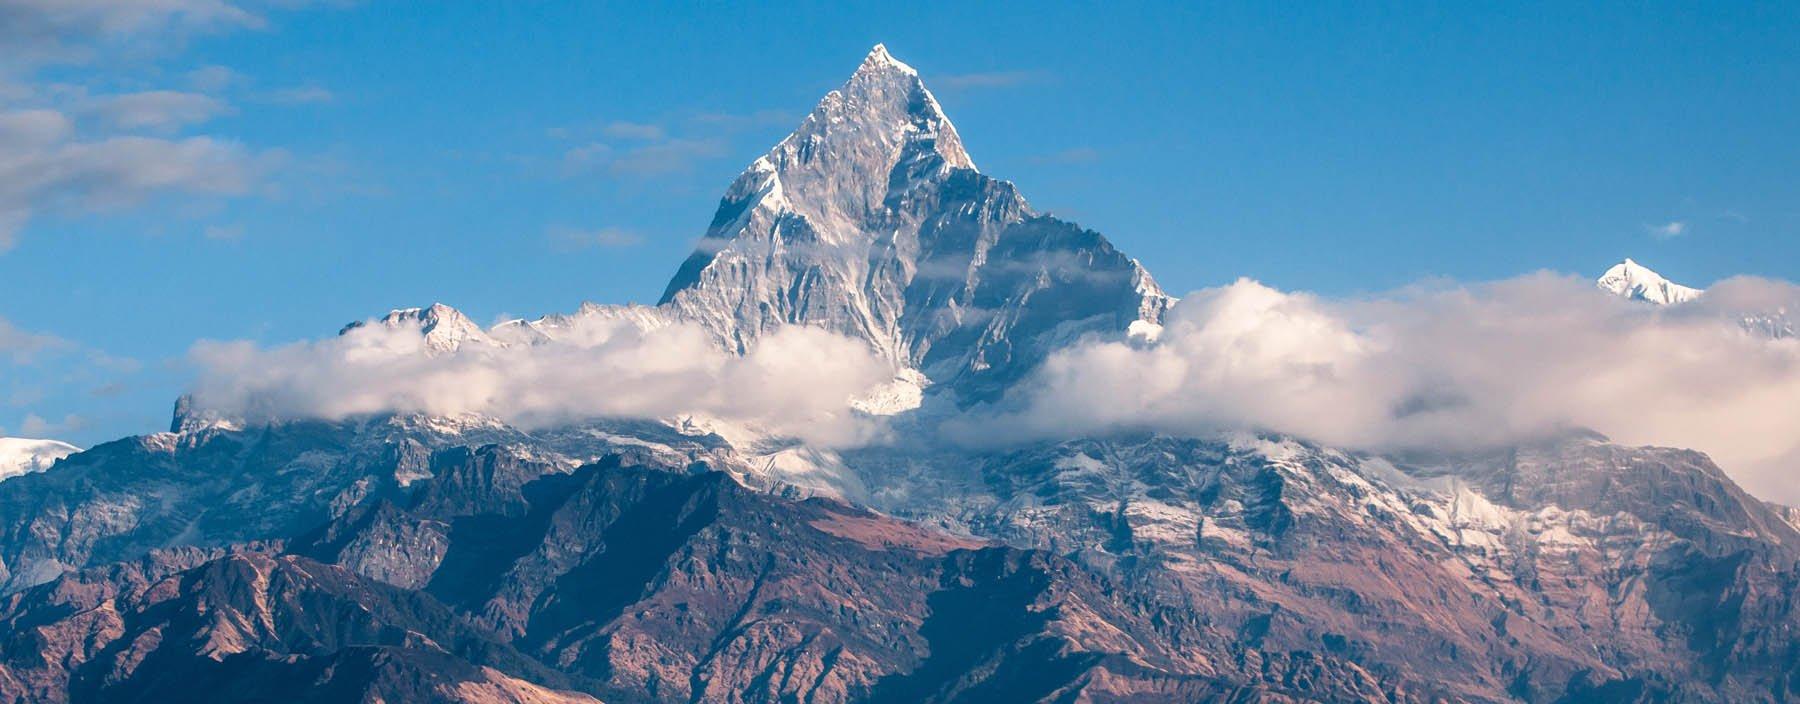 np, pokhara, fishtail mountain.jpg